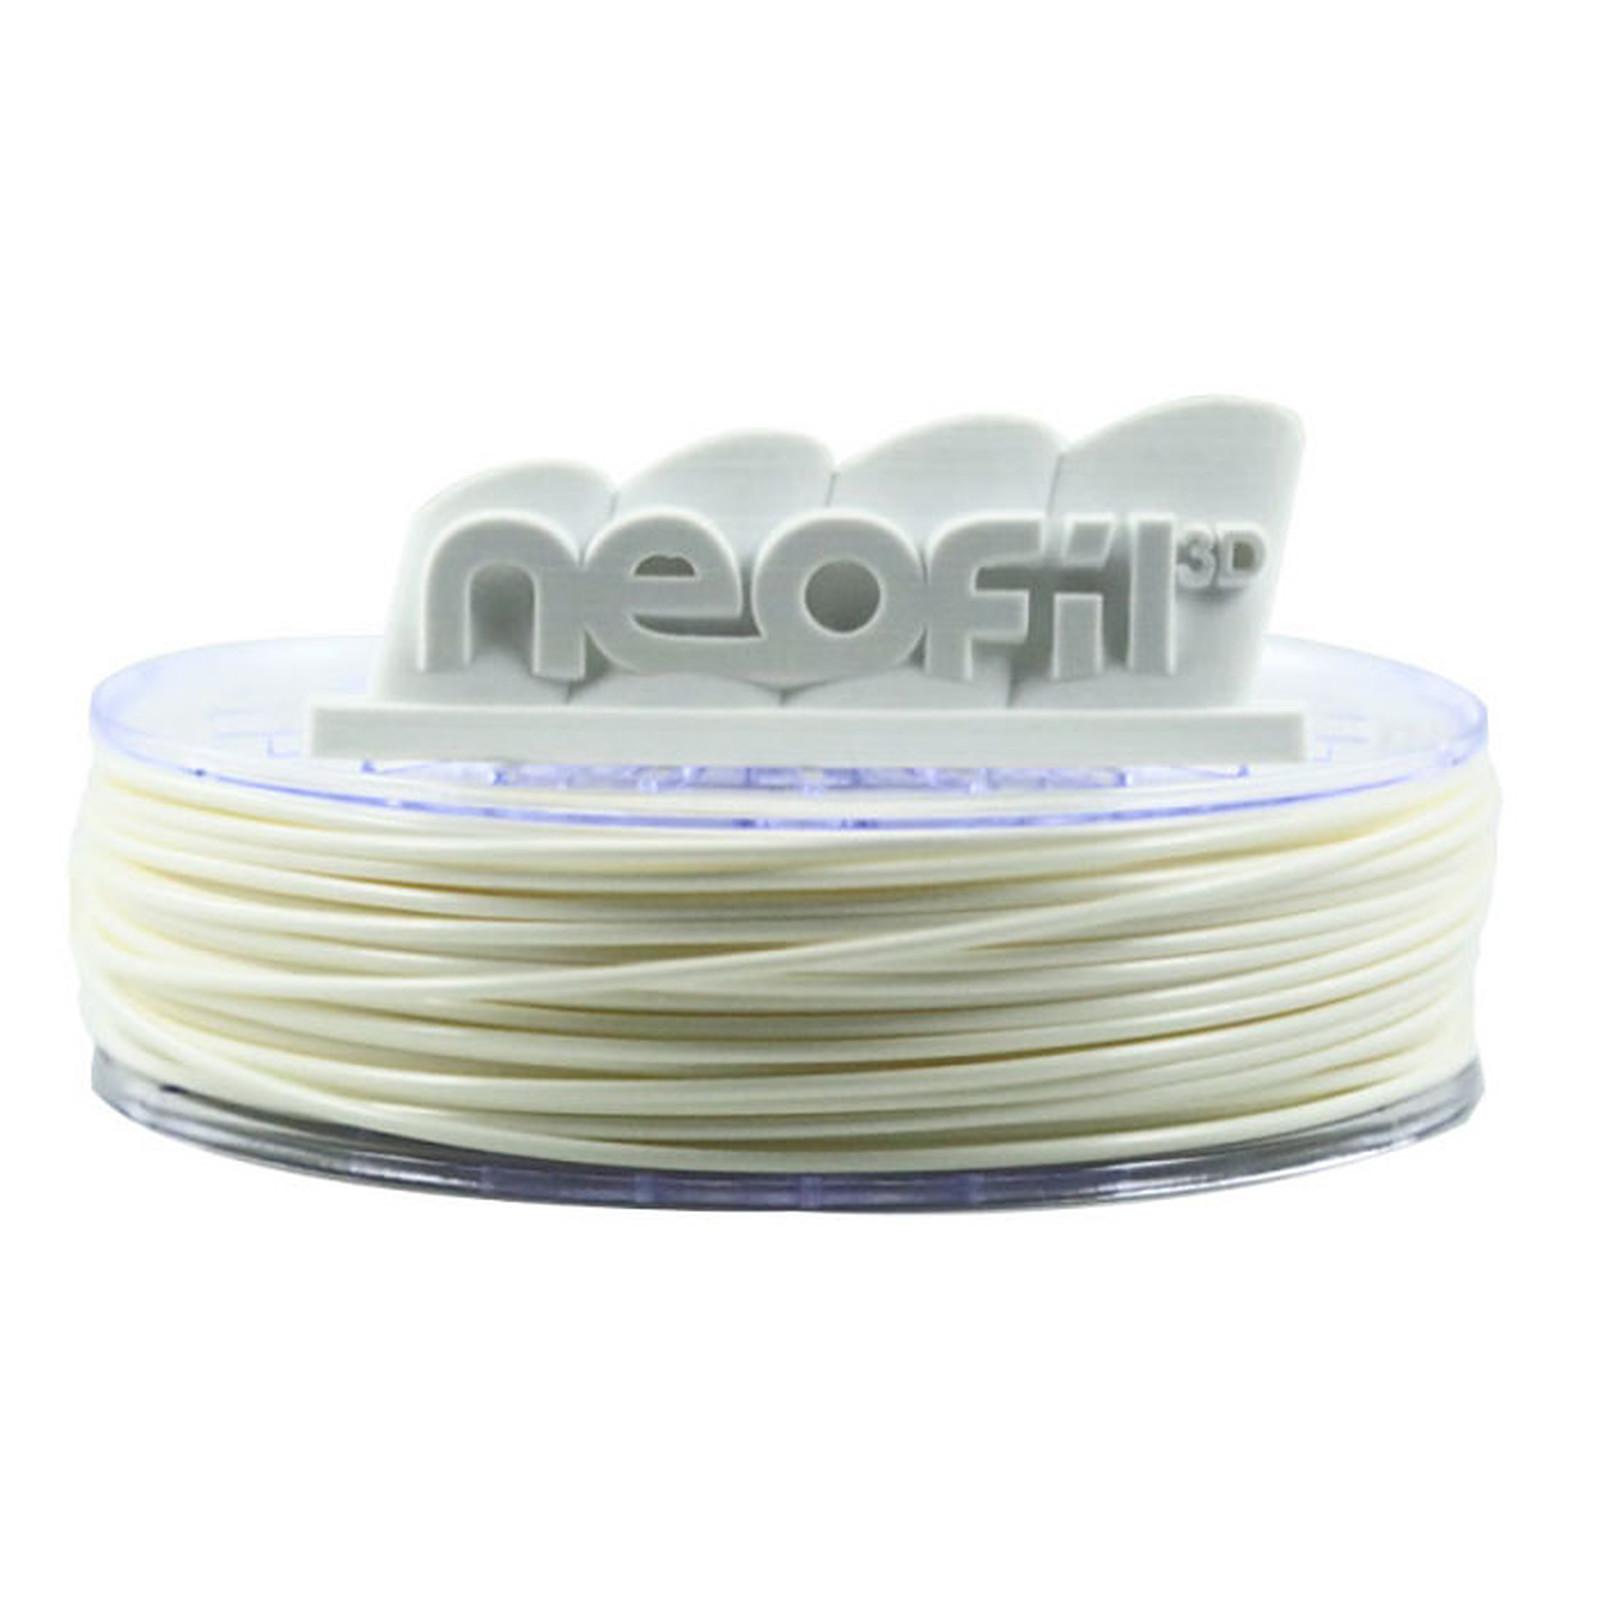 Neofil3D Bobine ABS 2.85mm 750g - Blanc